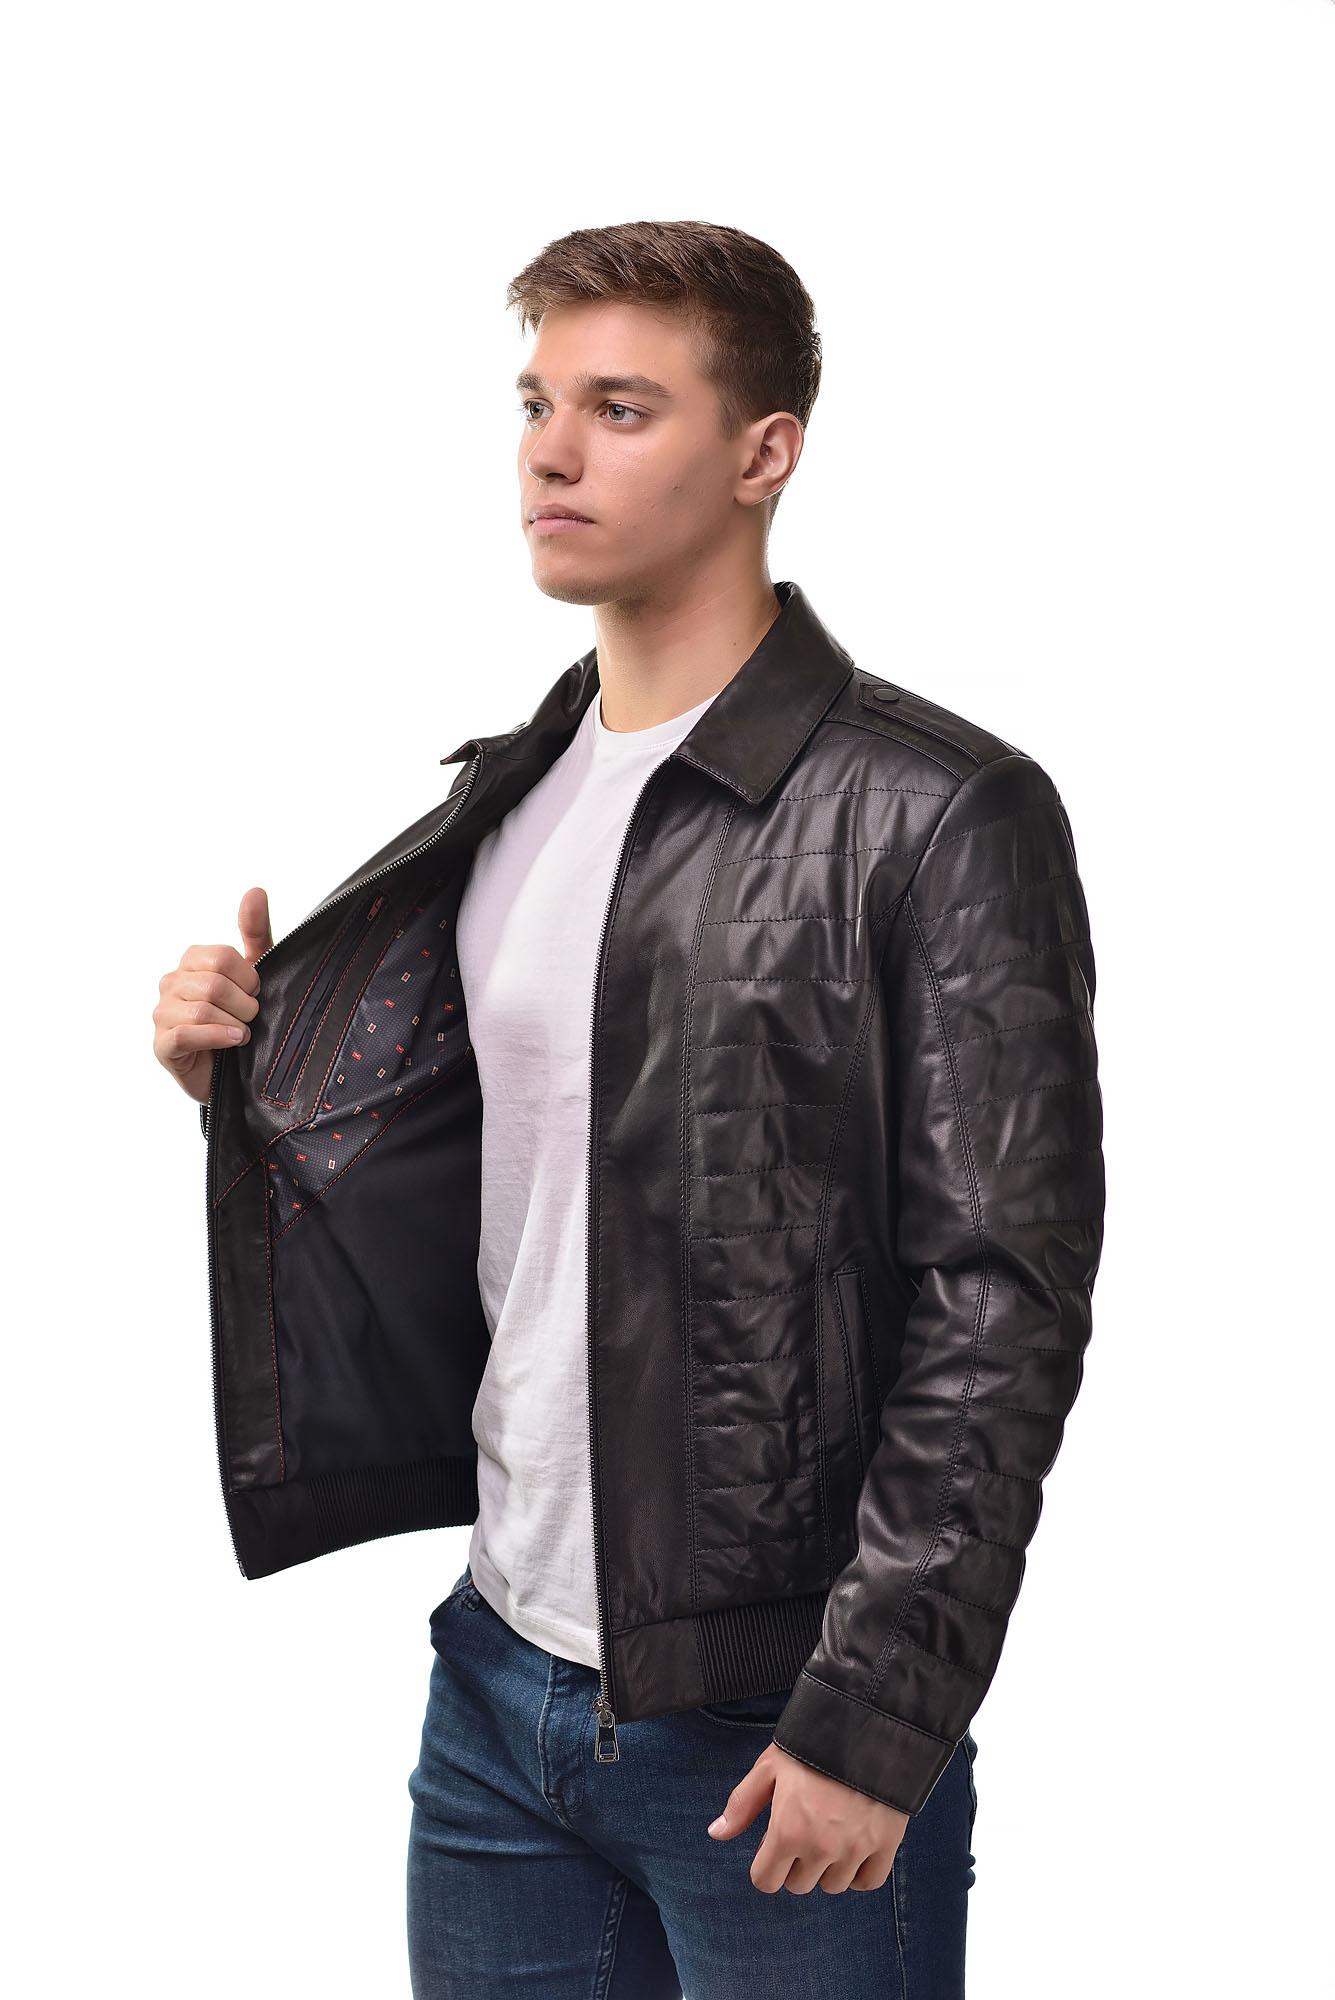 Мужская Кожаная куртка6160